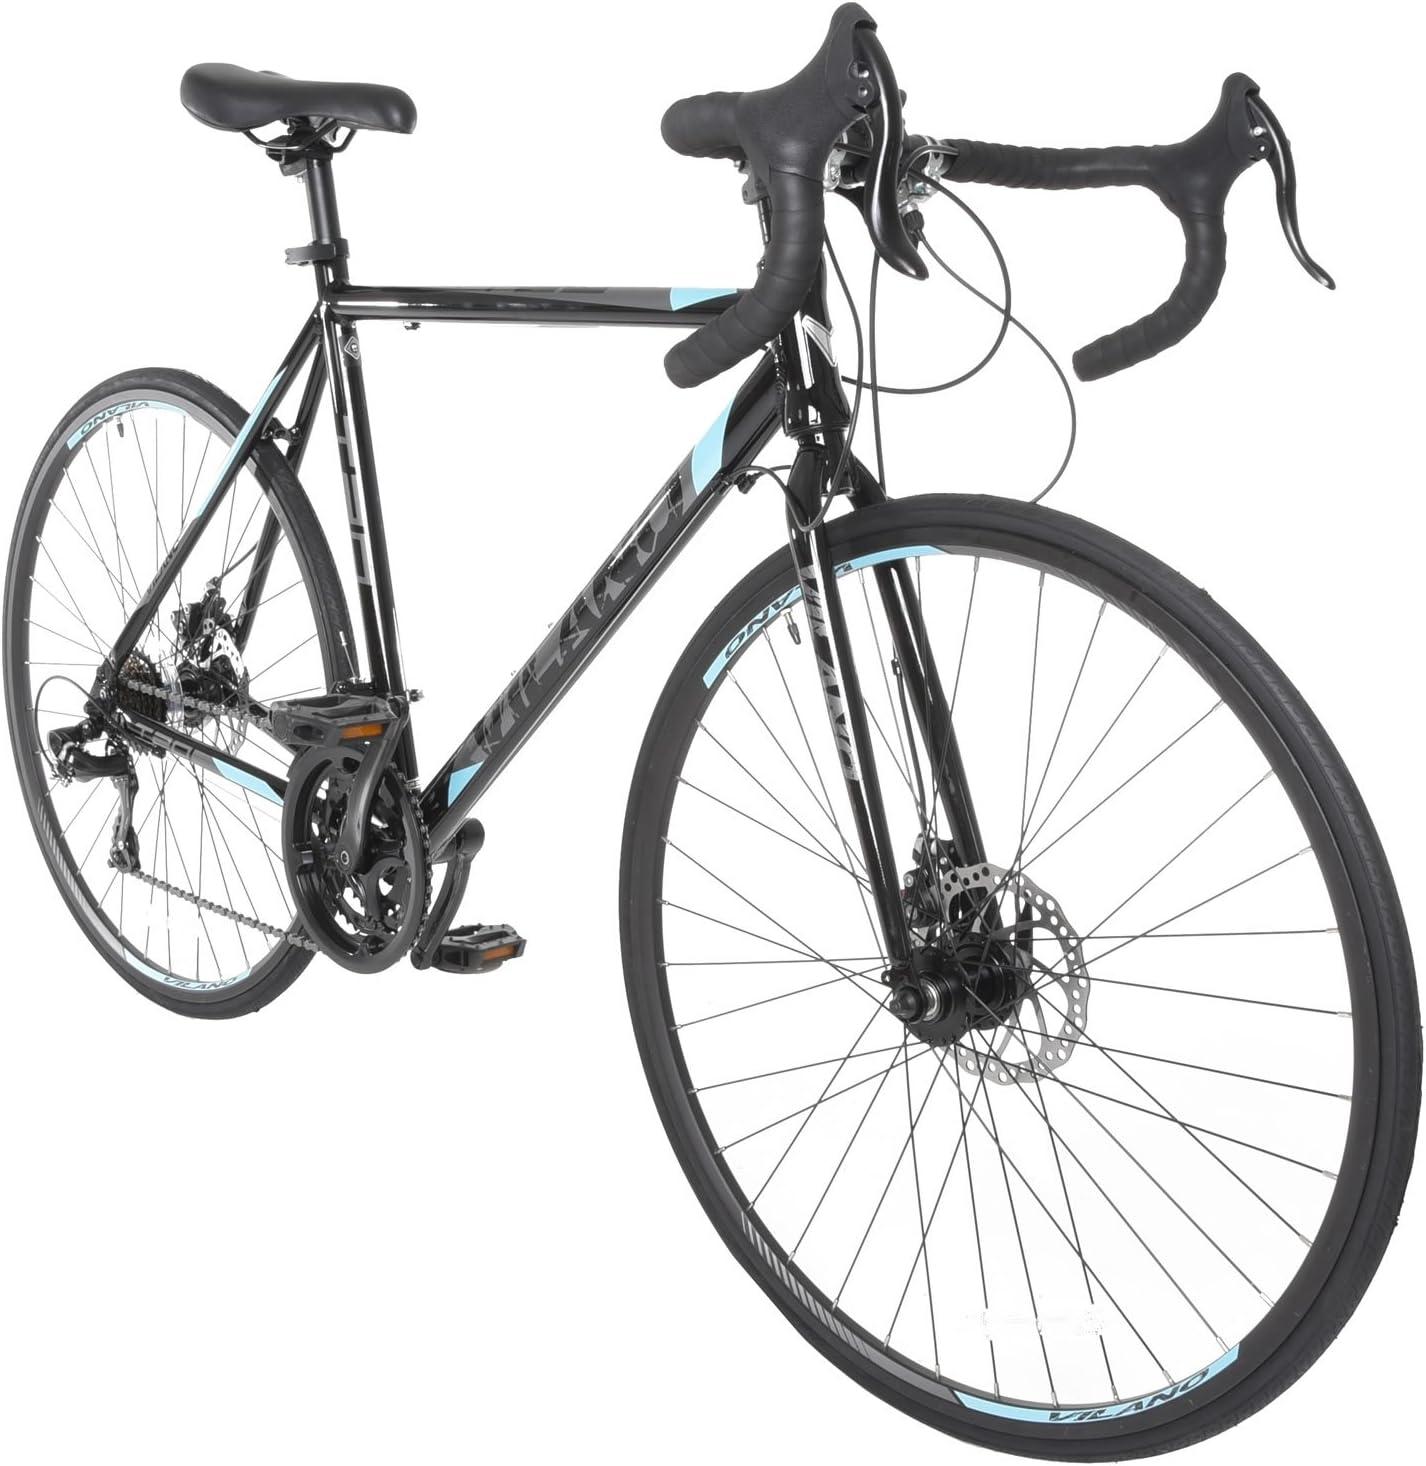 Vilano TUONO 2.0 Aluminum Road Bike Shimano 21 Speed Disc Brakes 700c